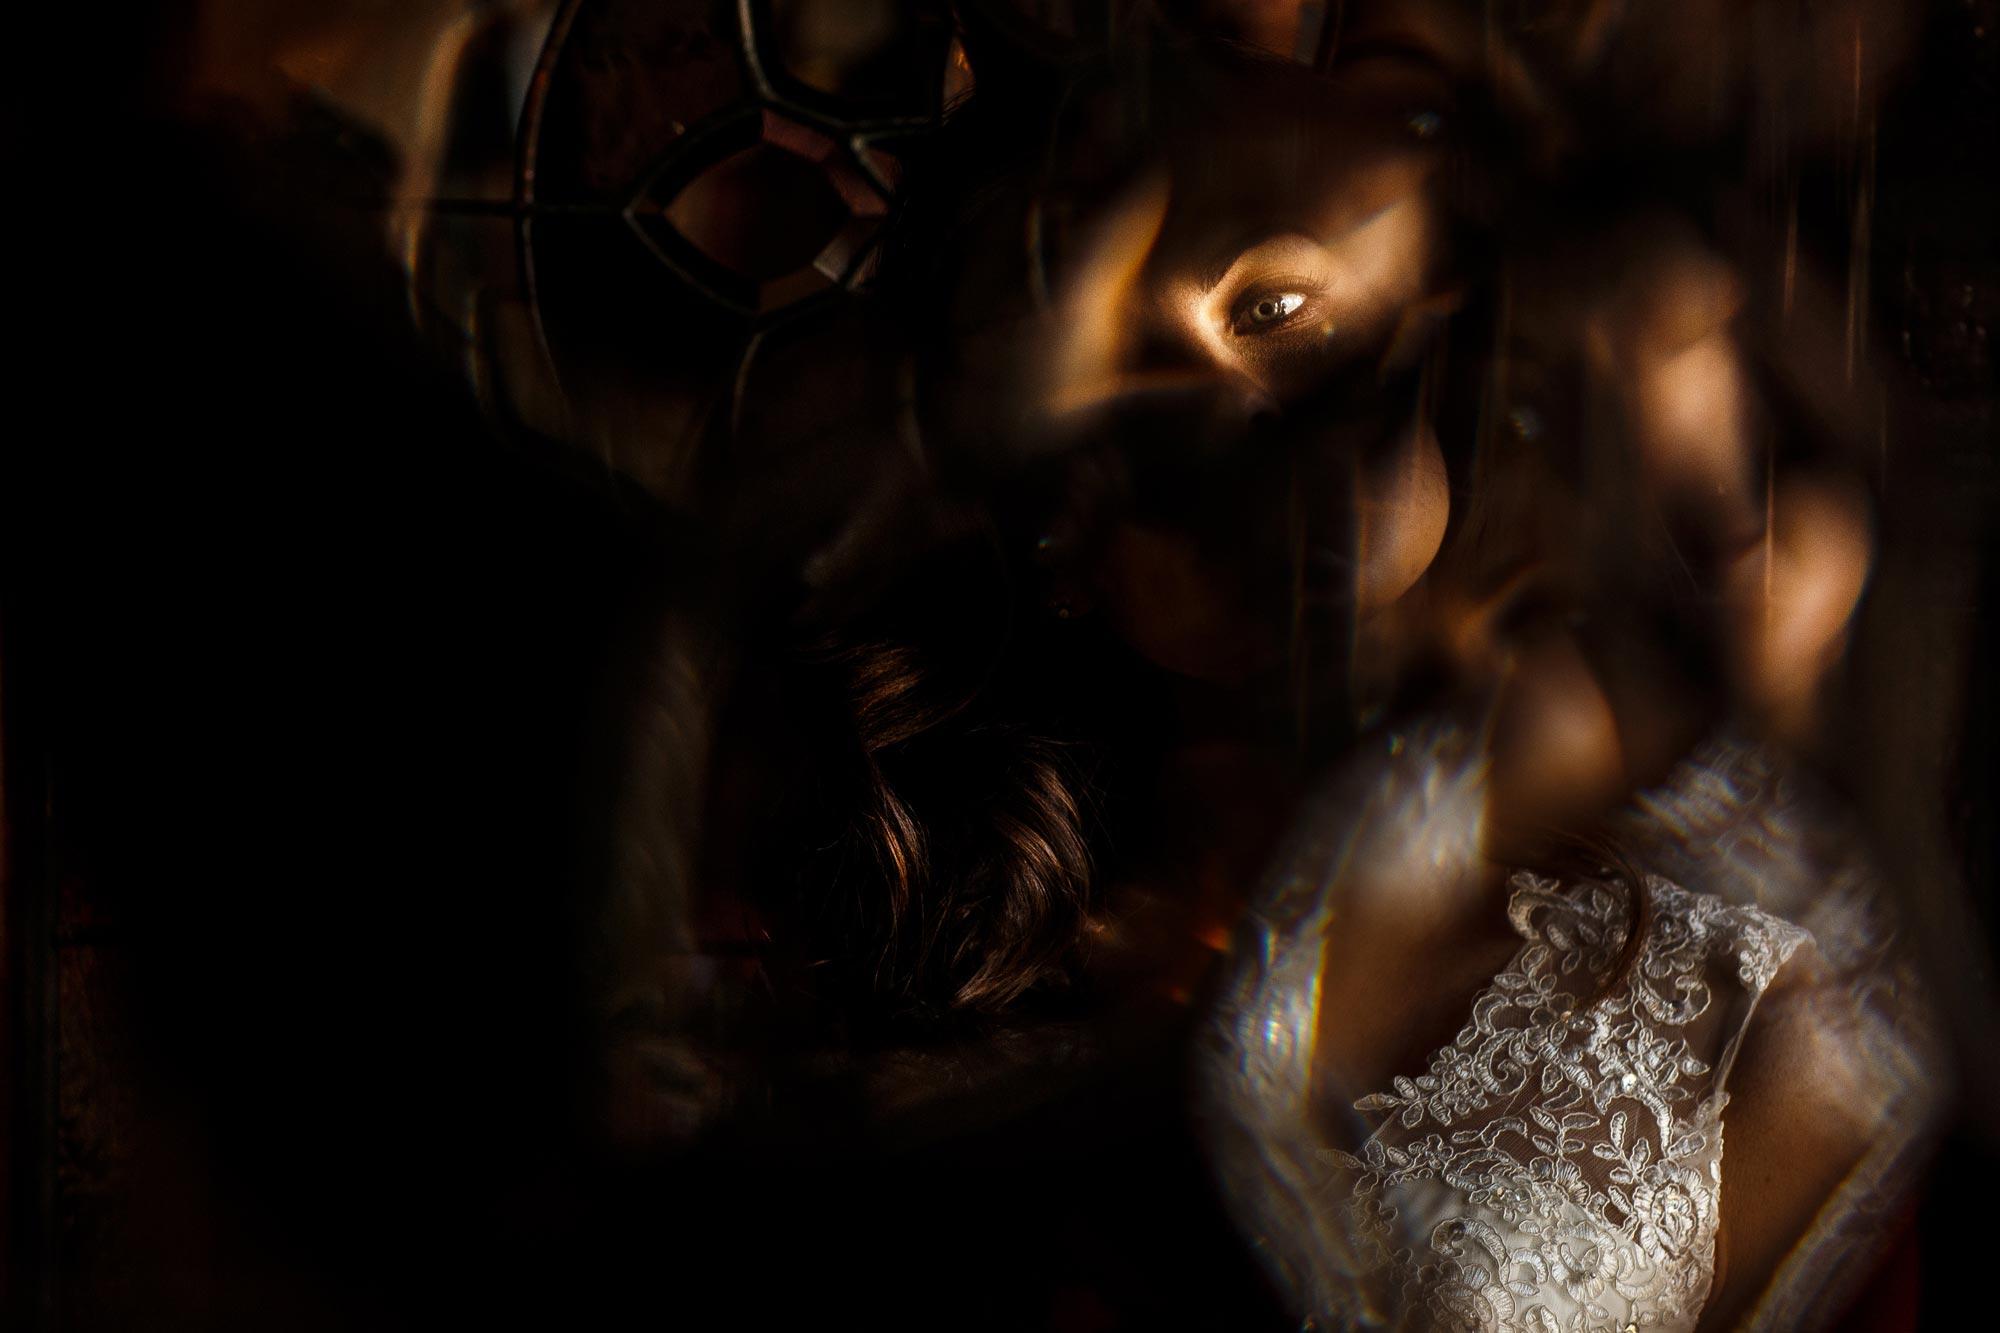 Creative unique wedding photograph of brides facial features